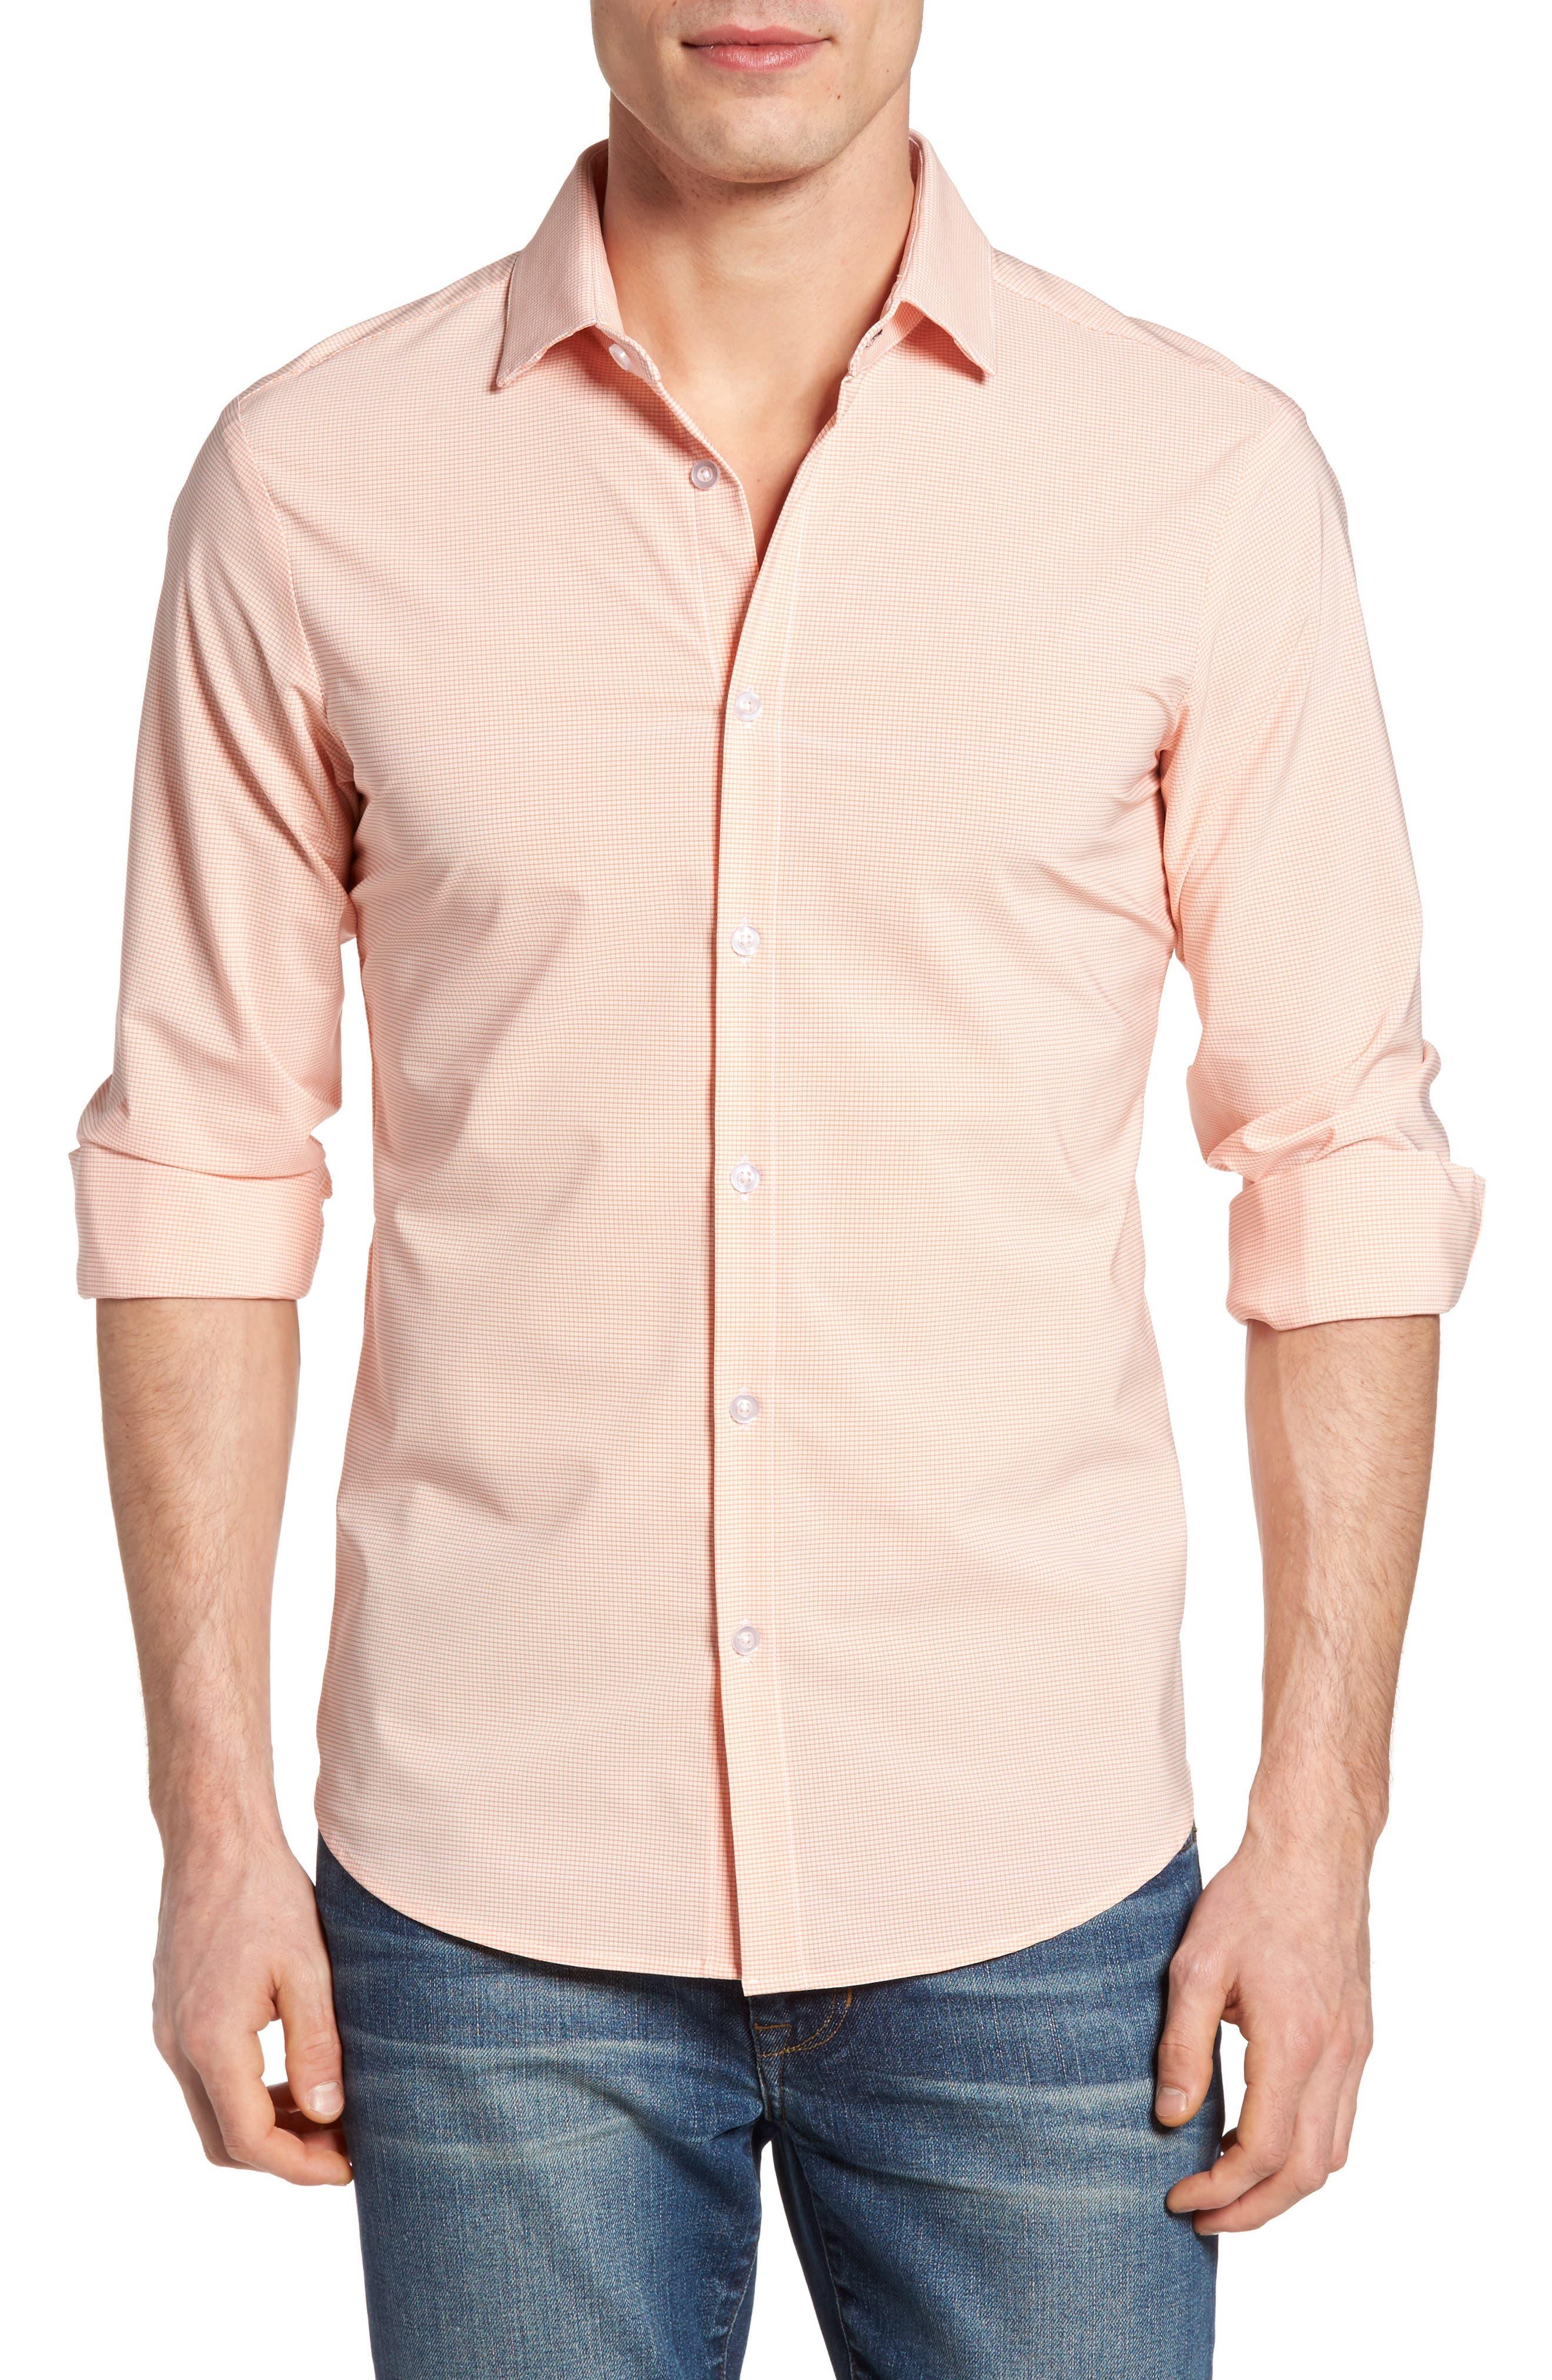 Charles Microcheck Performance Sport Shirt,                         Main,                         color, Peach